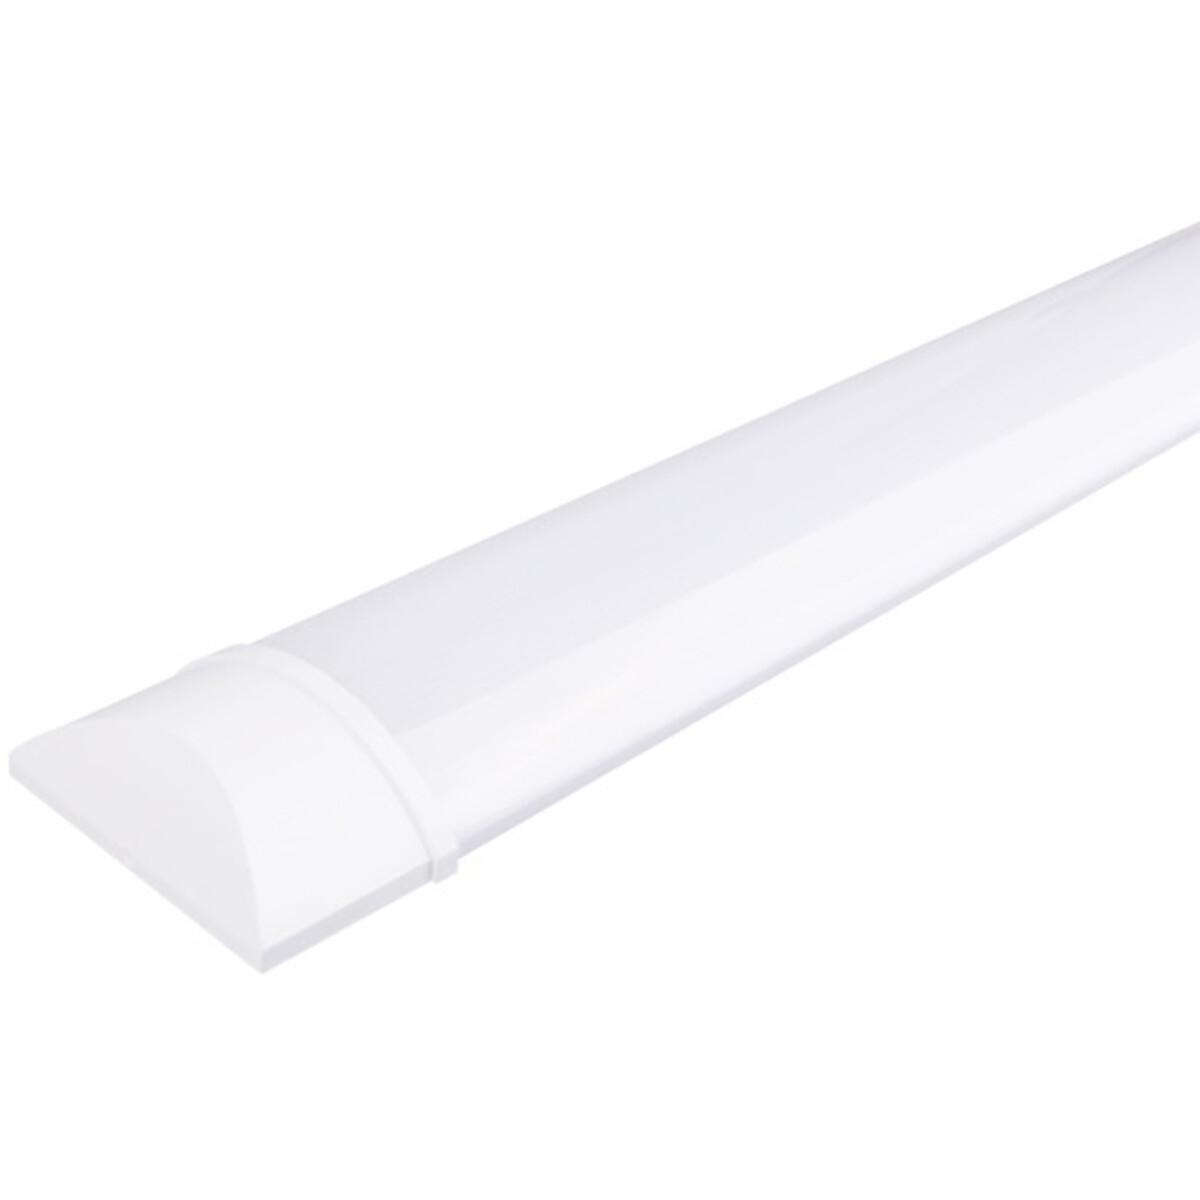 LED Balk - Aigi Tynom - 30W - Natuurlijk Wit 4000K - Mat Wit - Kunststof - 90cm